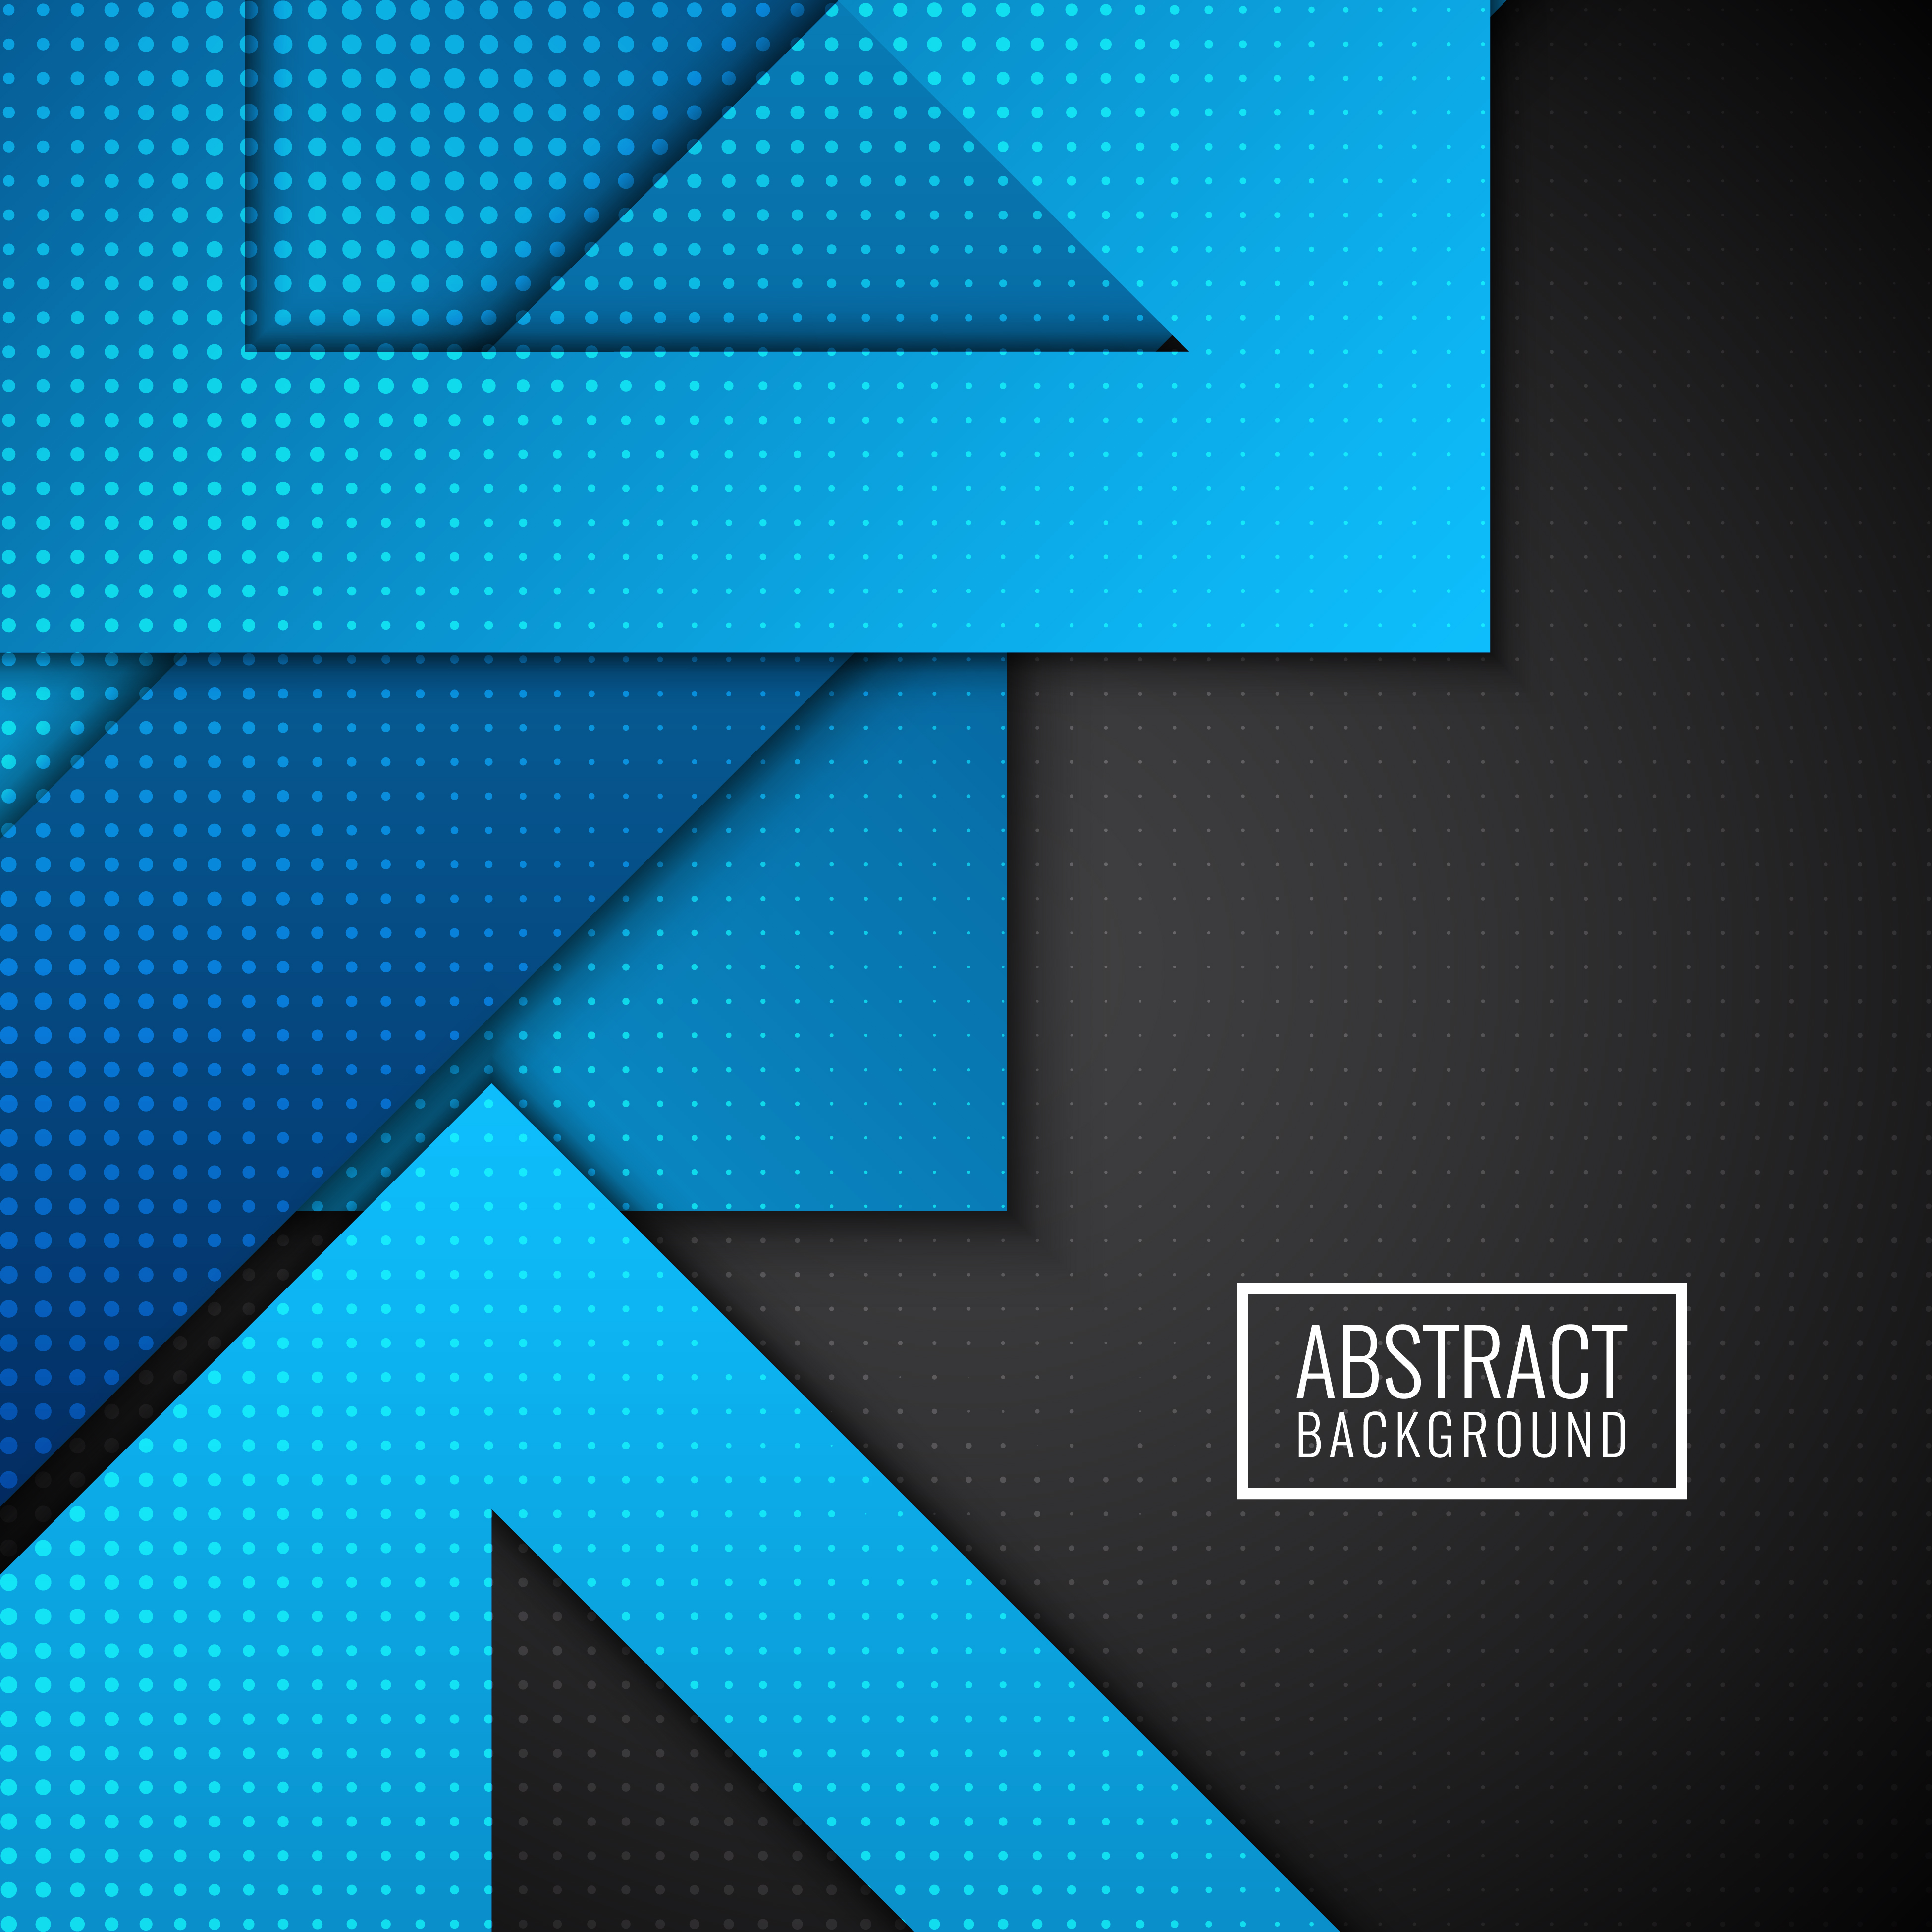 Abstract Modern Geometric Shape Background